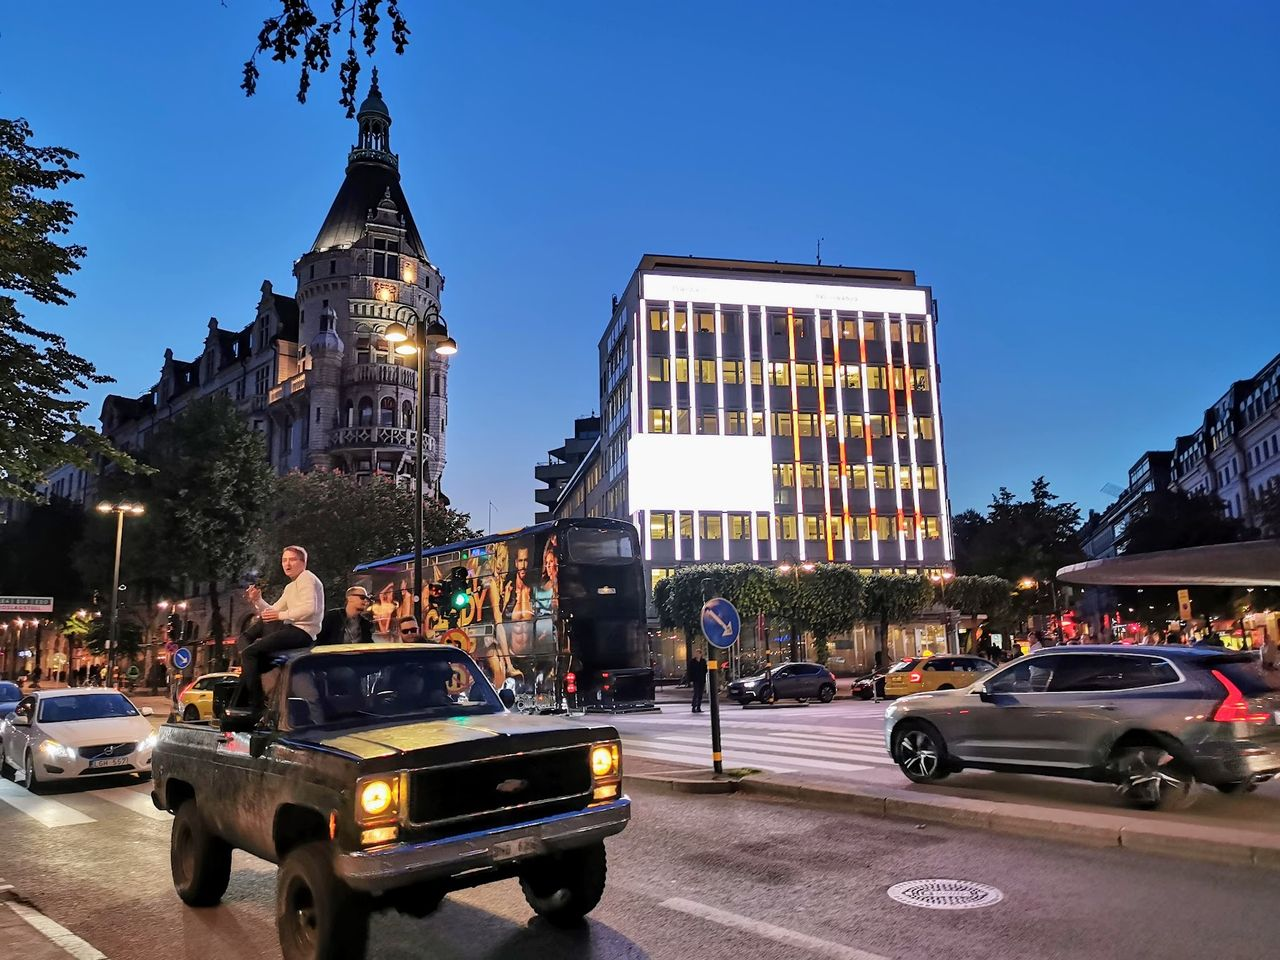 Stockholm vill stoppa fortkörare med geofencing